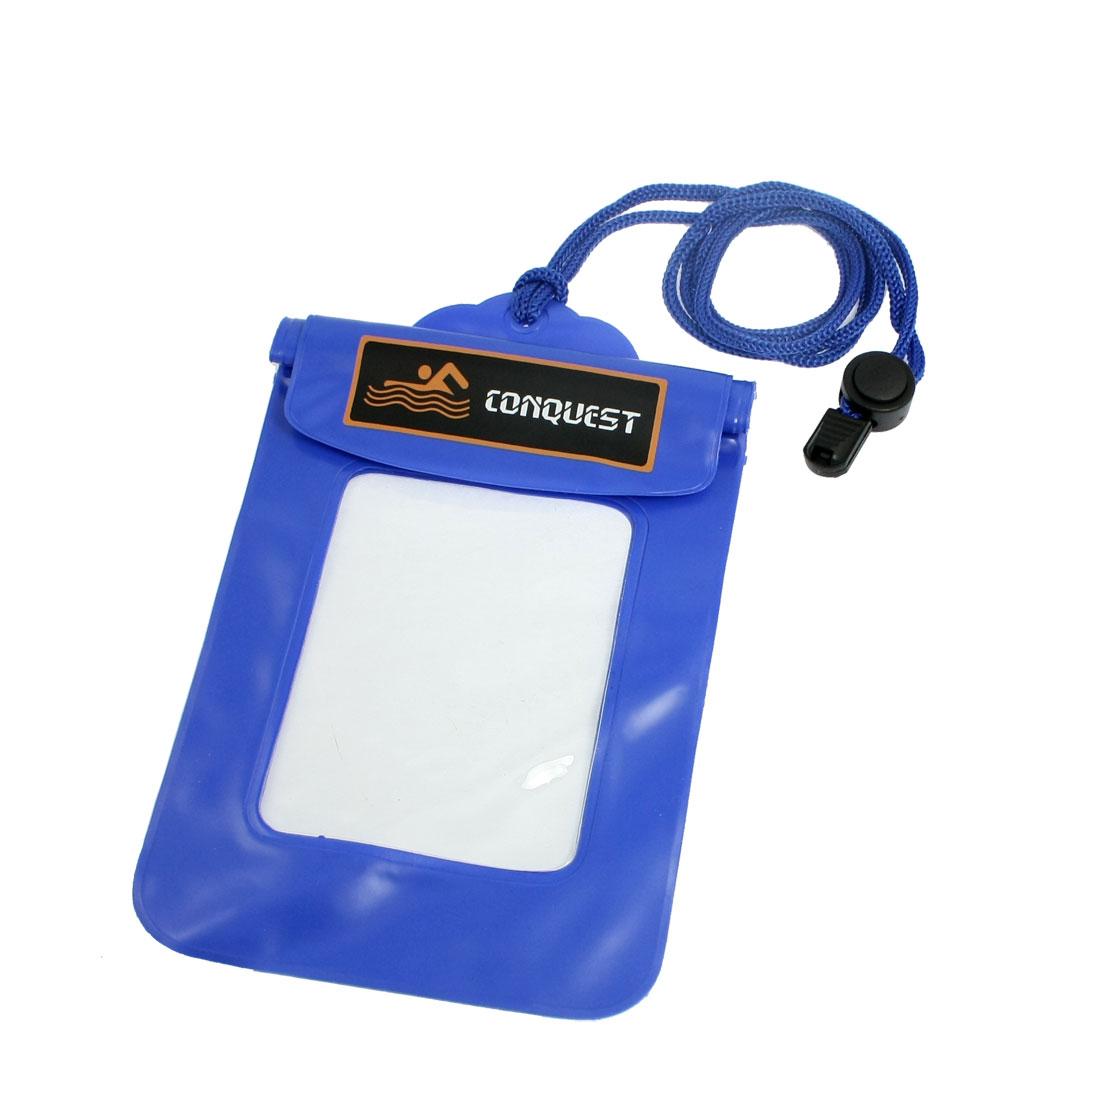 Adjustable Neck Strap Blue Clear Plastic Water Resistant Bag Pouch